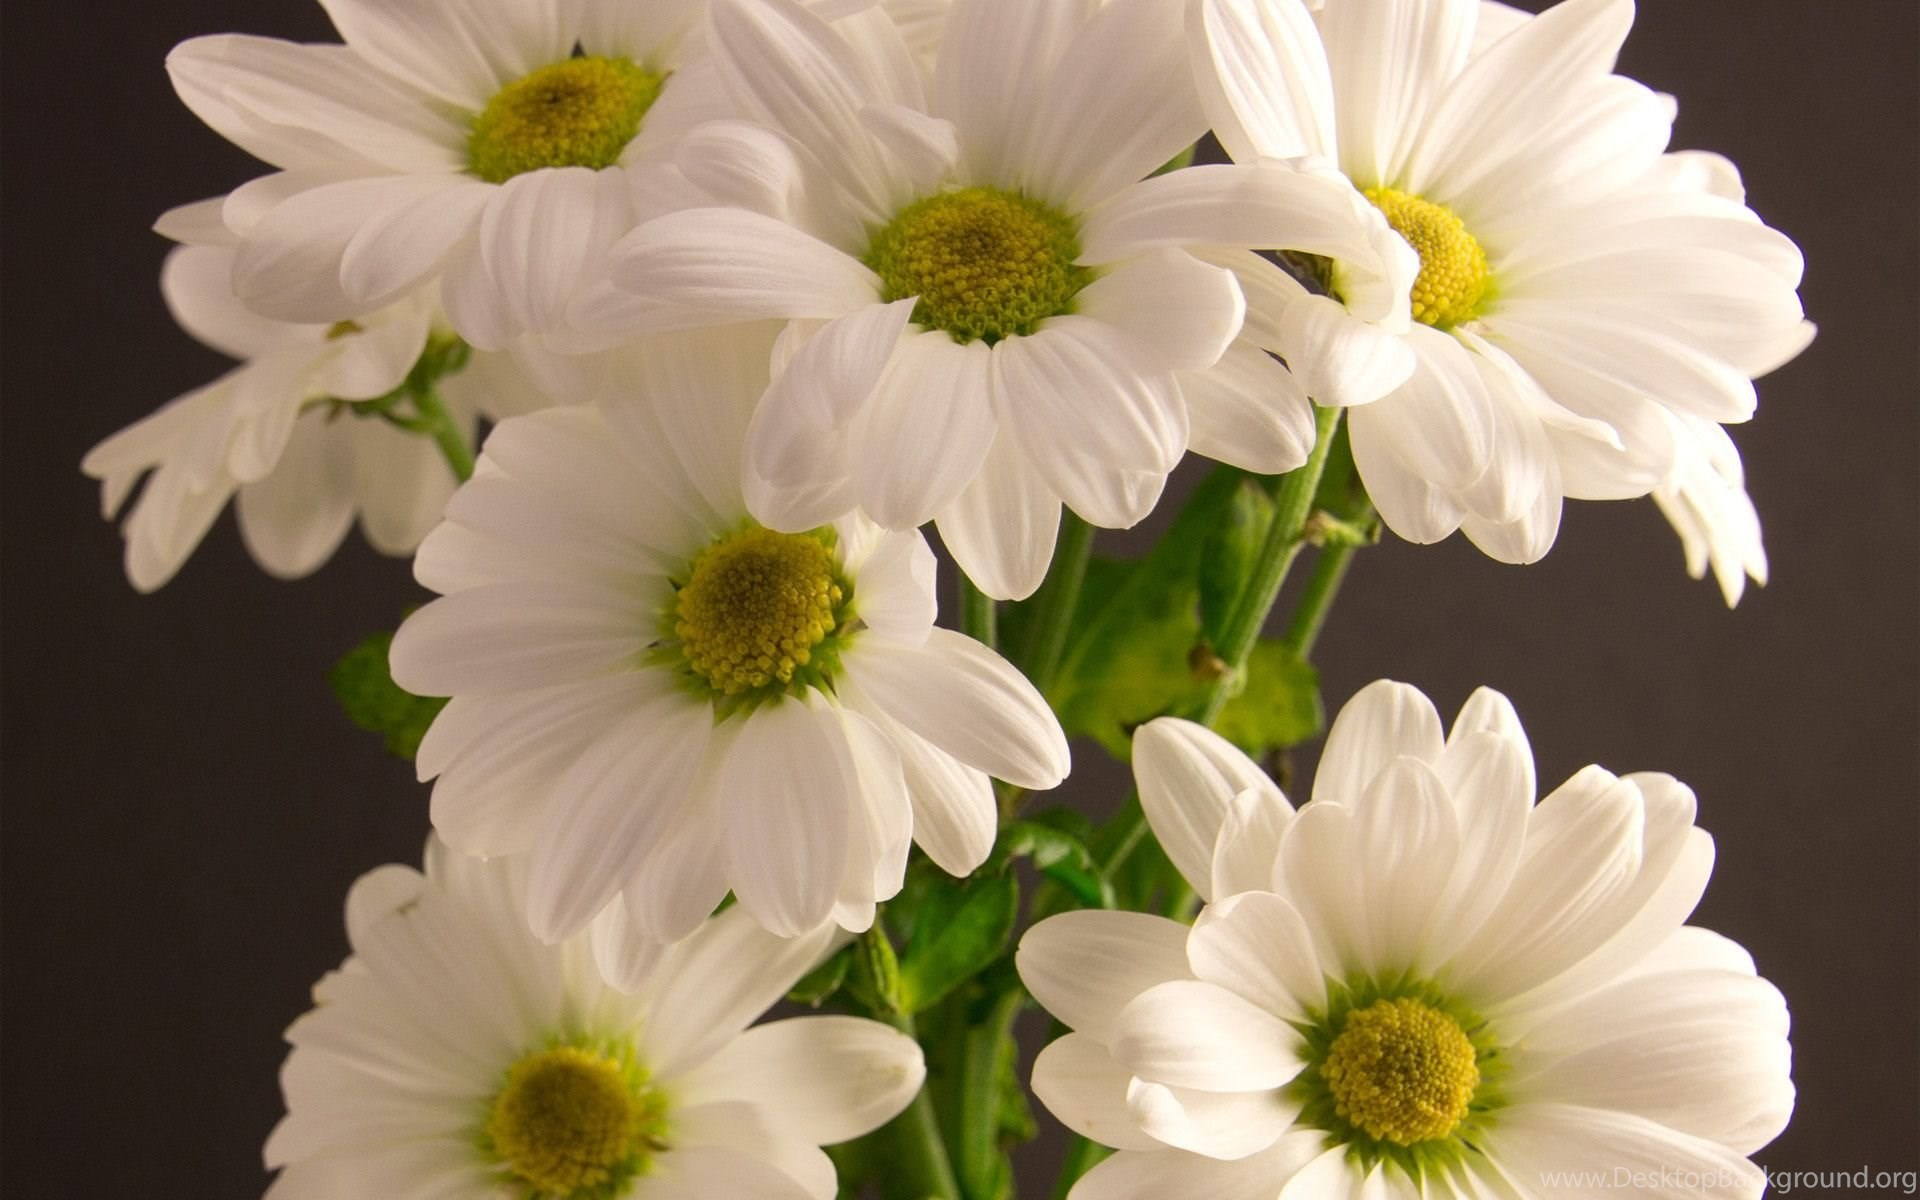 Bouquet Chrysanthemum White Flower Wallpapers Desktop Background